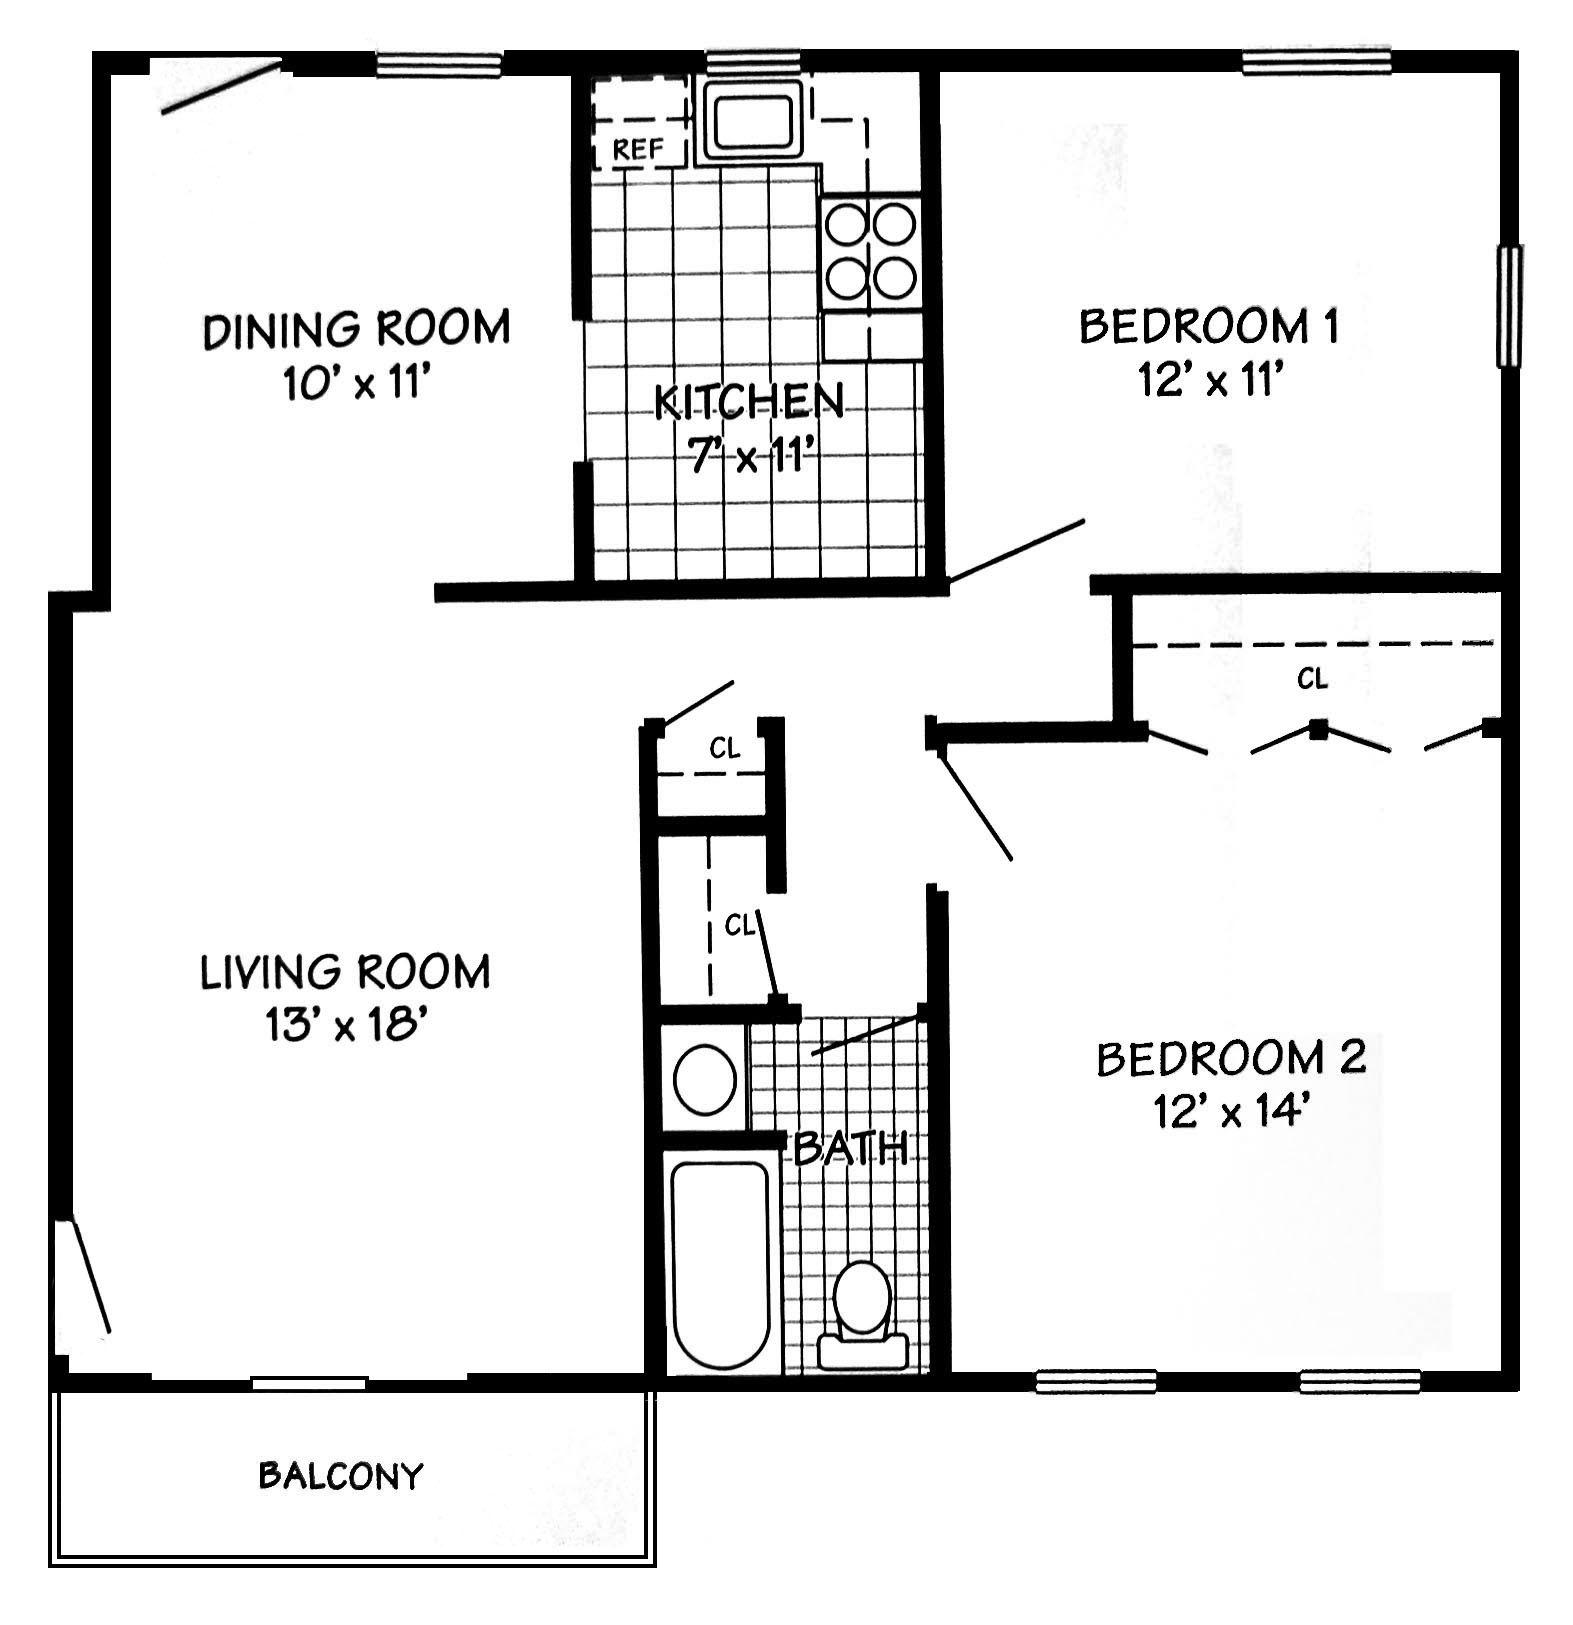 Maximum Occupancy One Bedroom Apartment Nj | www ...